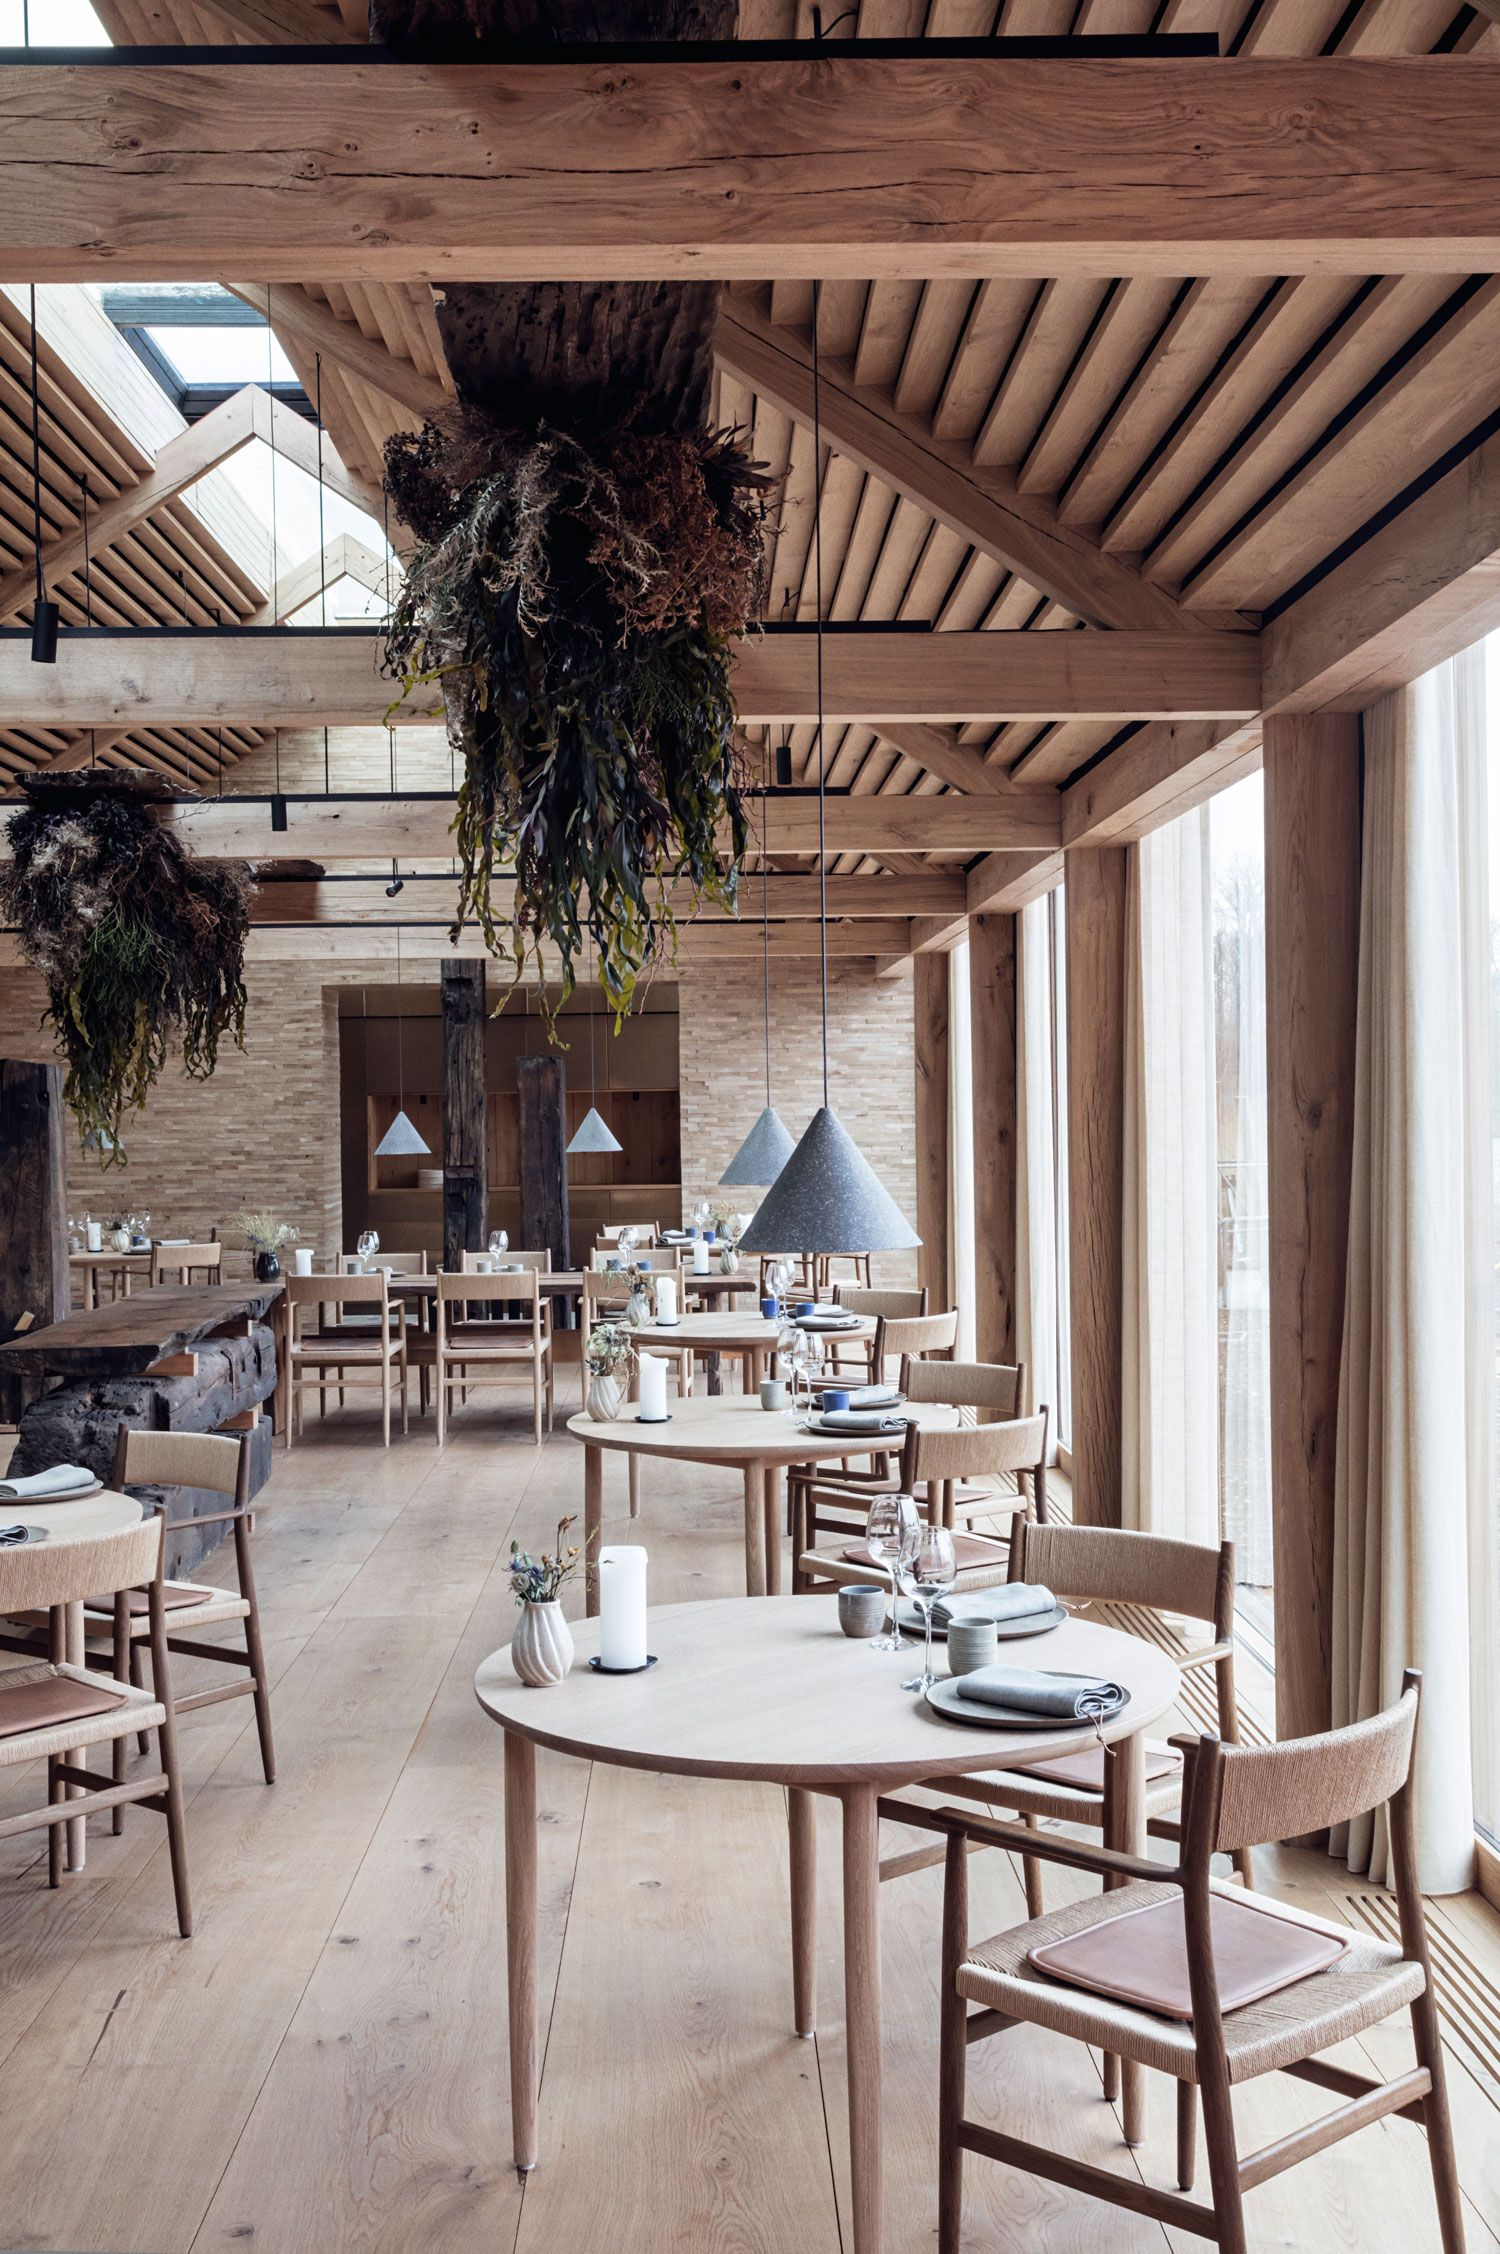 Noma Restaurant In Copenhagen By Studio Thulstrup Noma